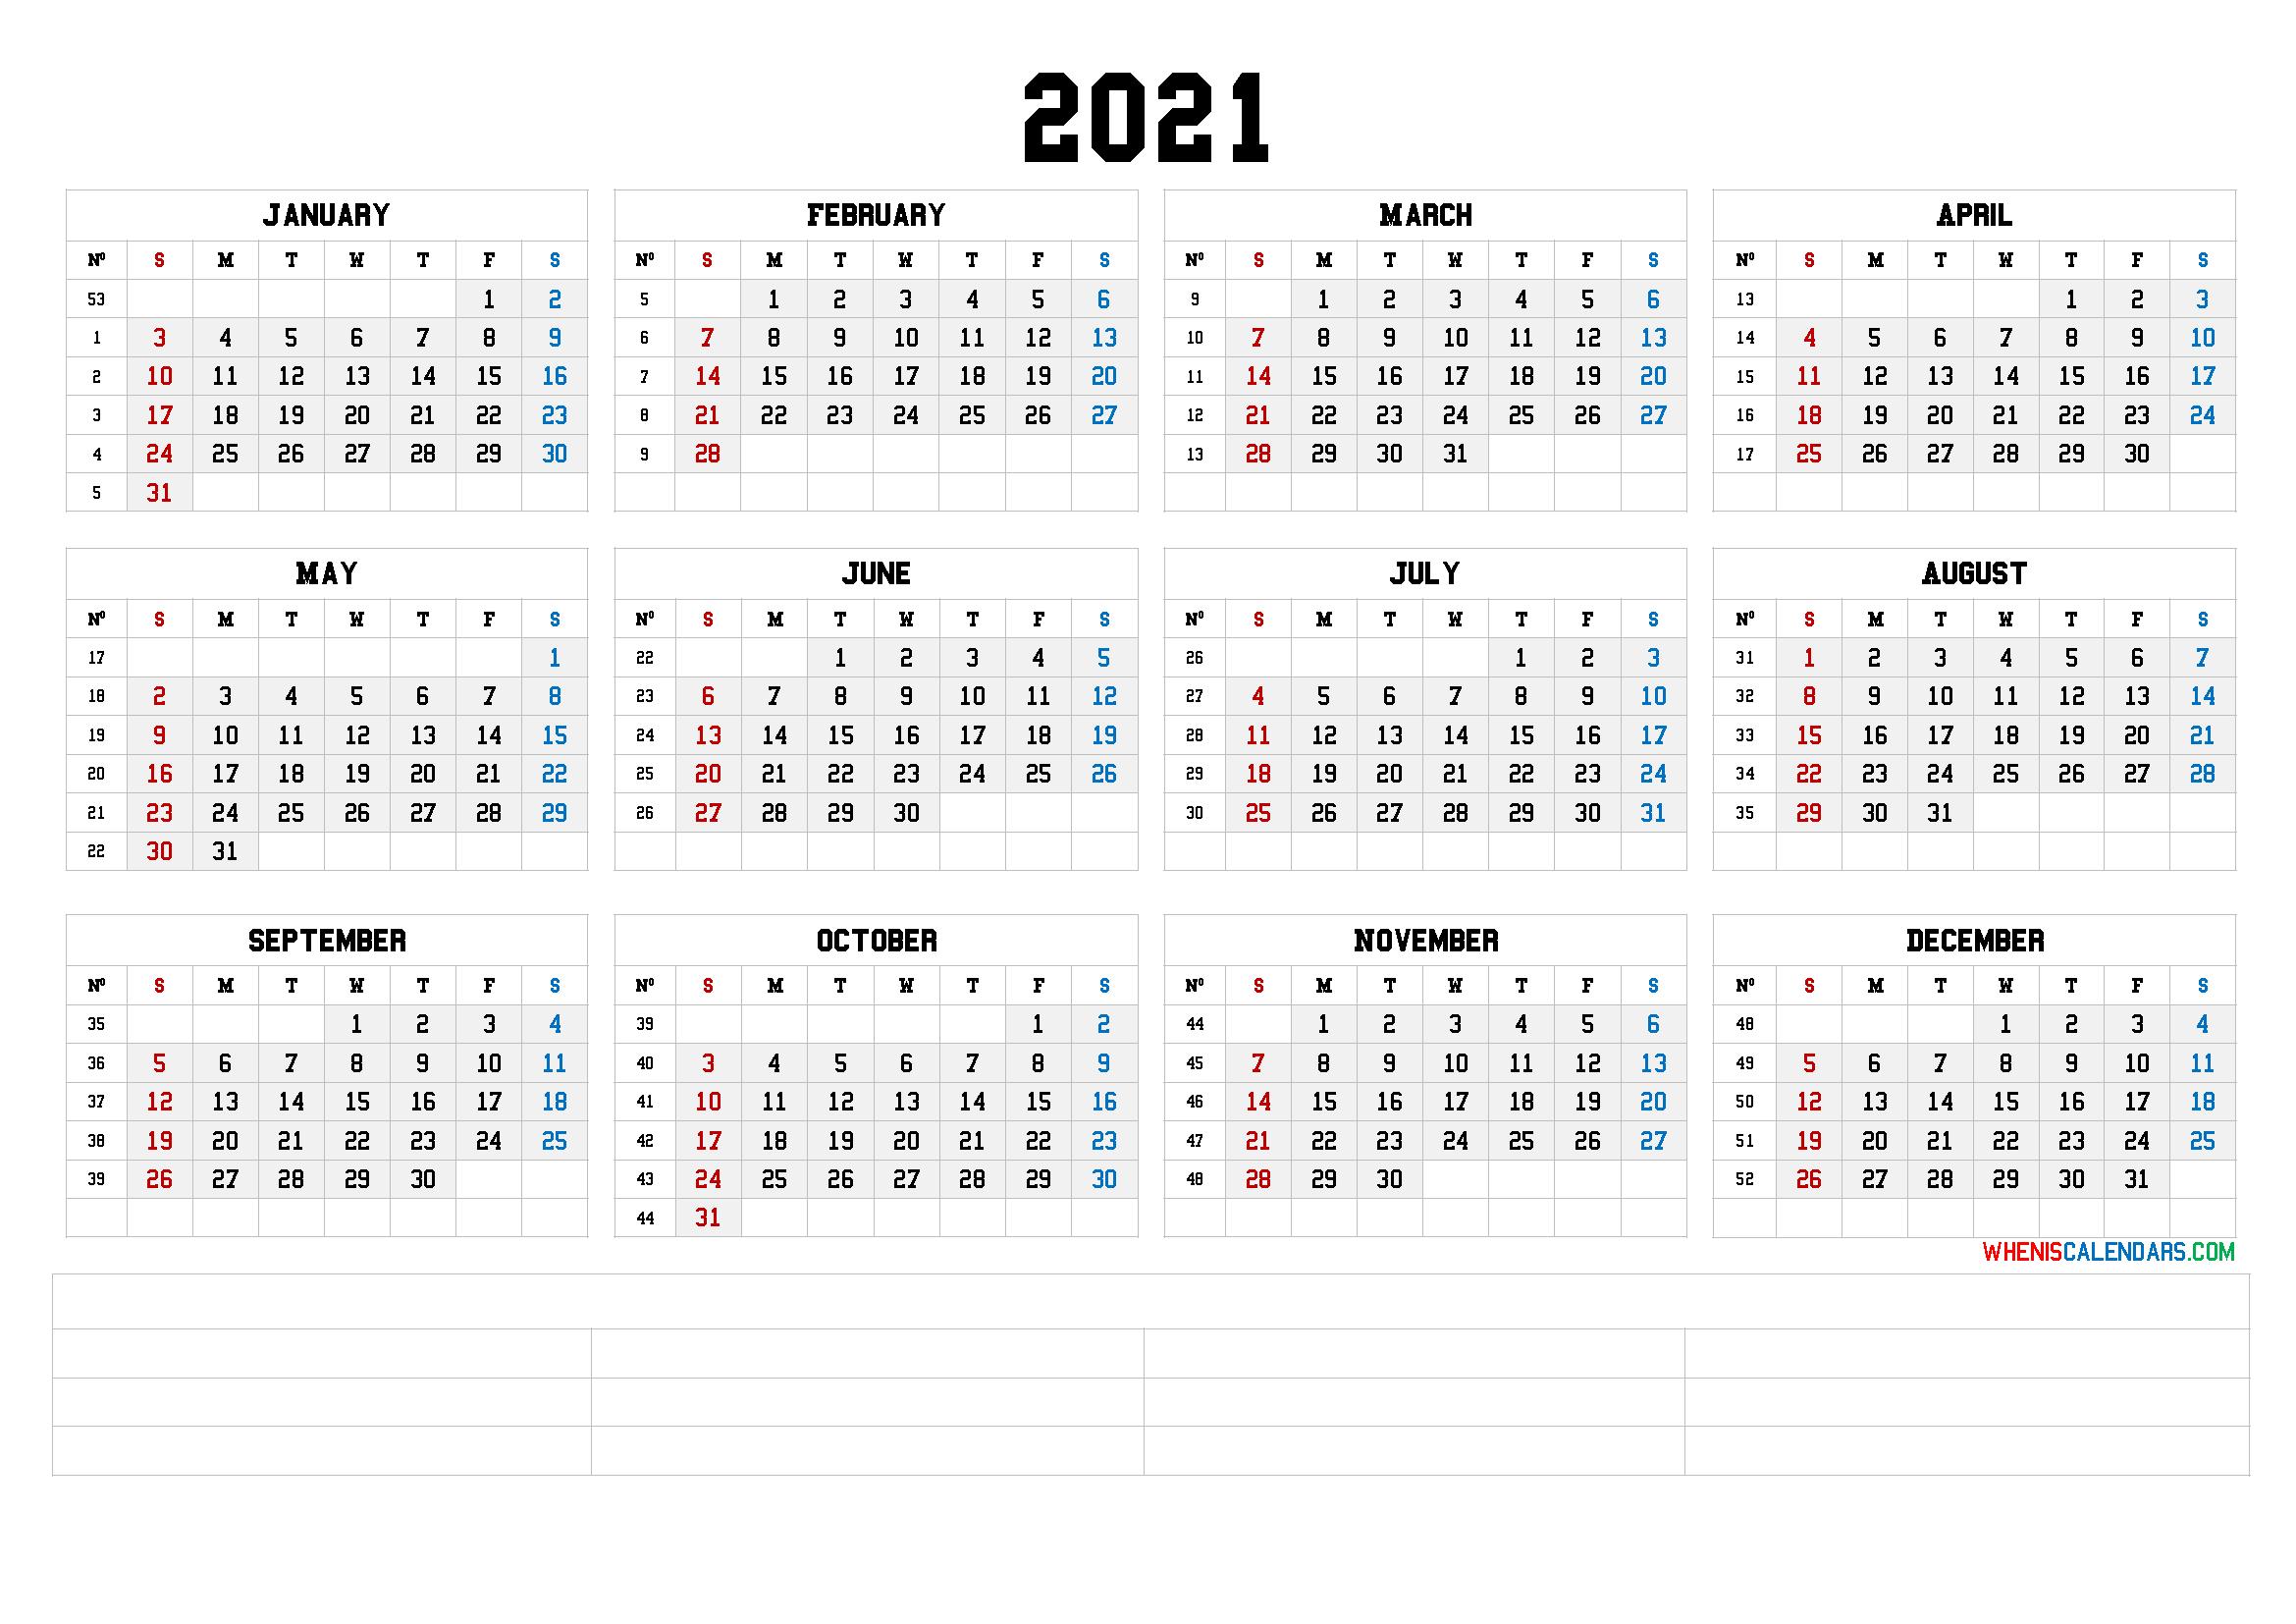 2021 12 Month Calendar Printable [Premium Templates] – Free regarding 2021 Monthly Planner 12 Month